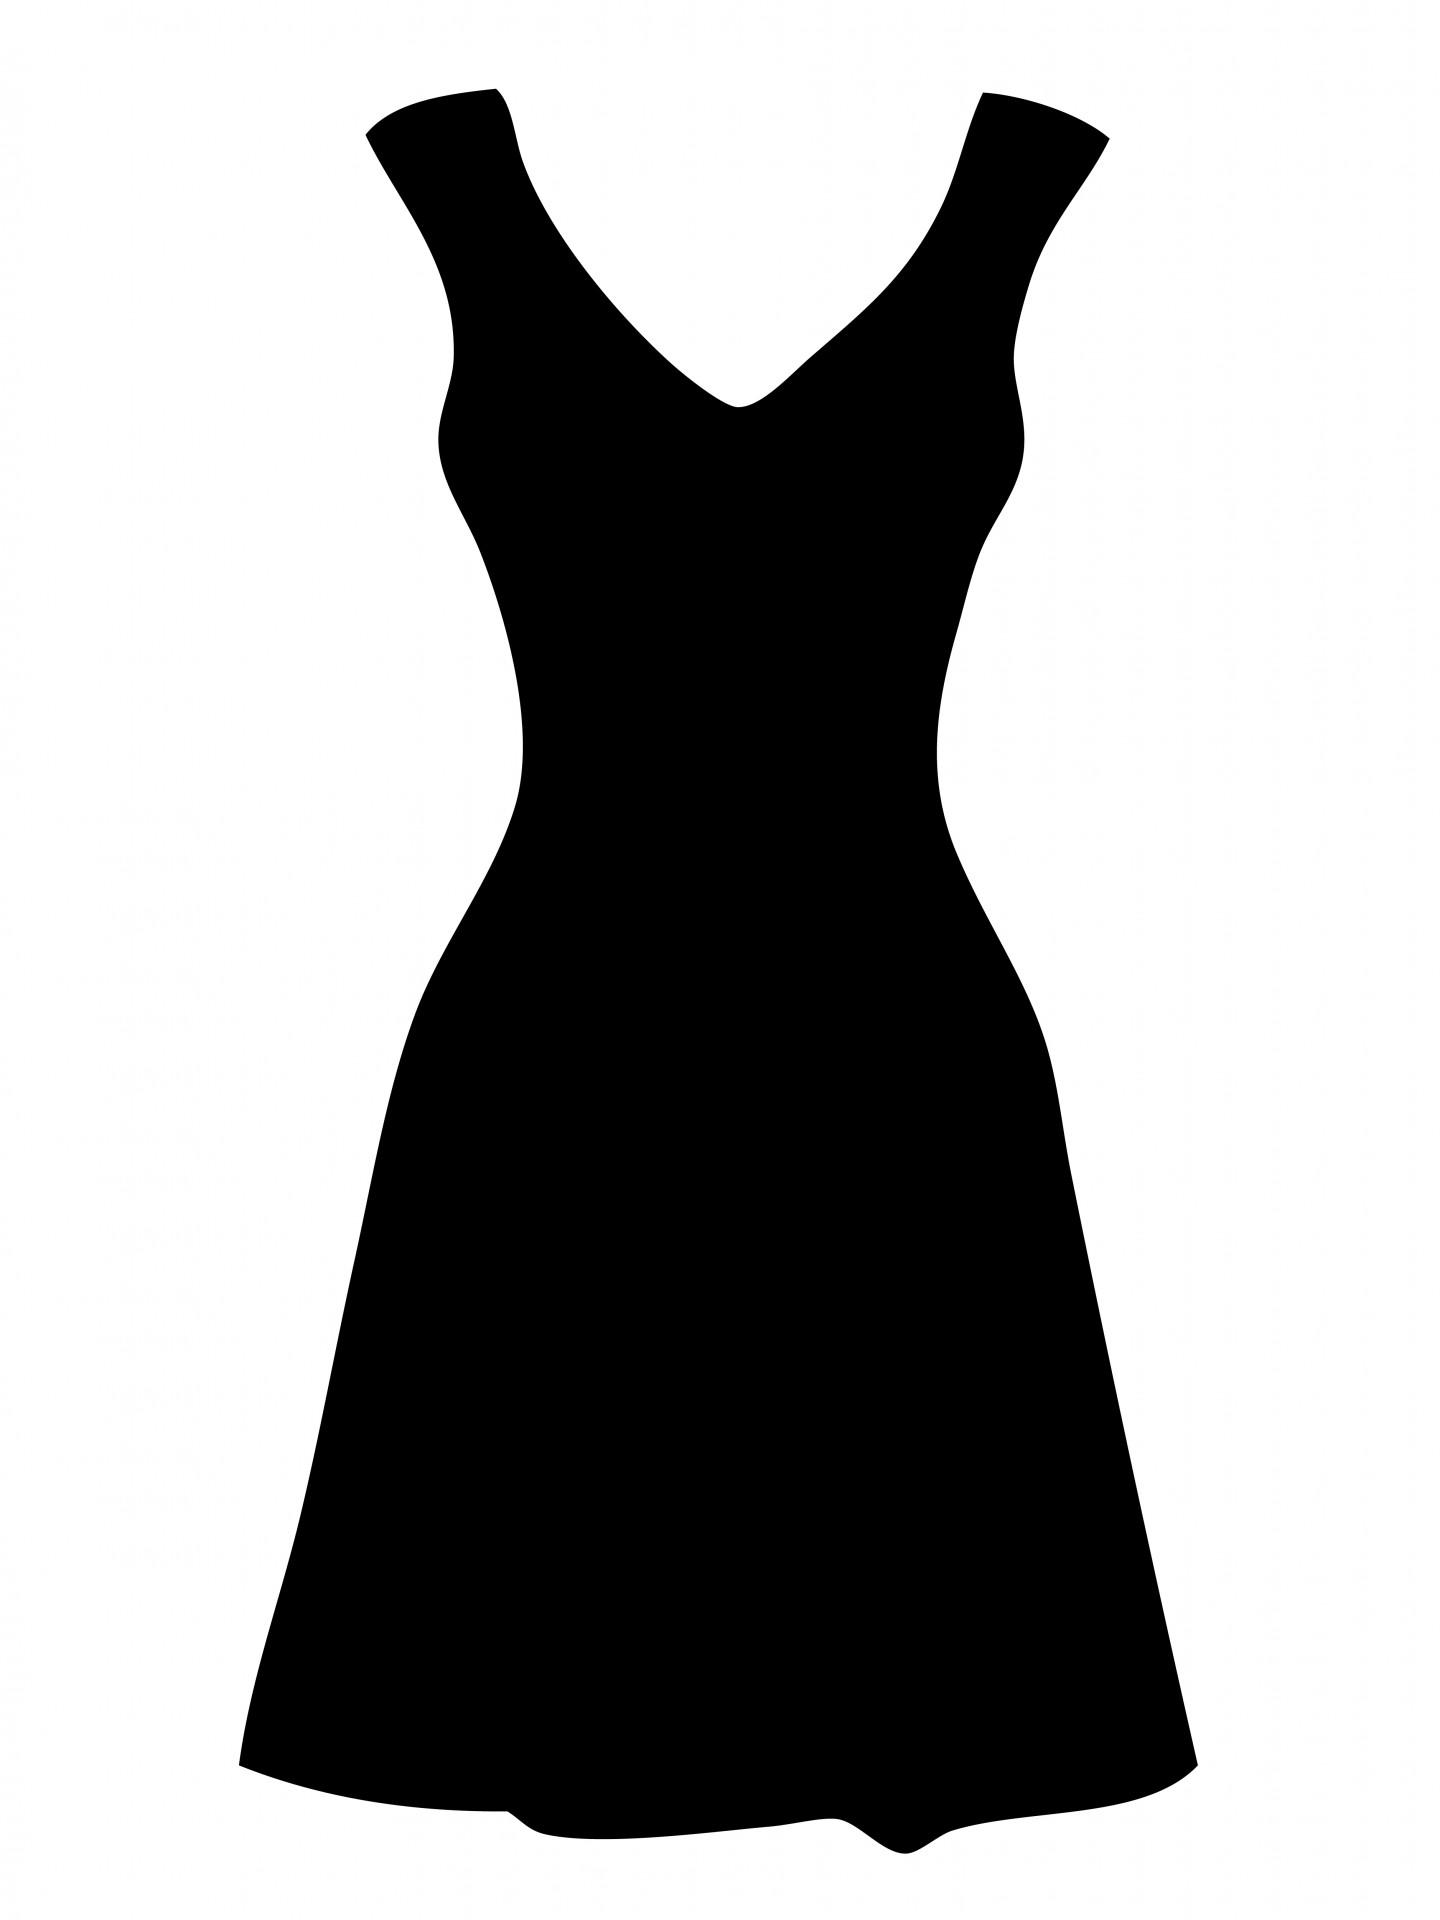 Purple Pirate Dress Clip Art. Silhouette Dress